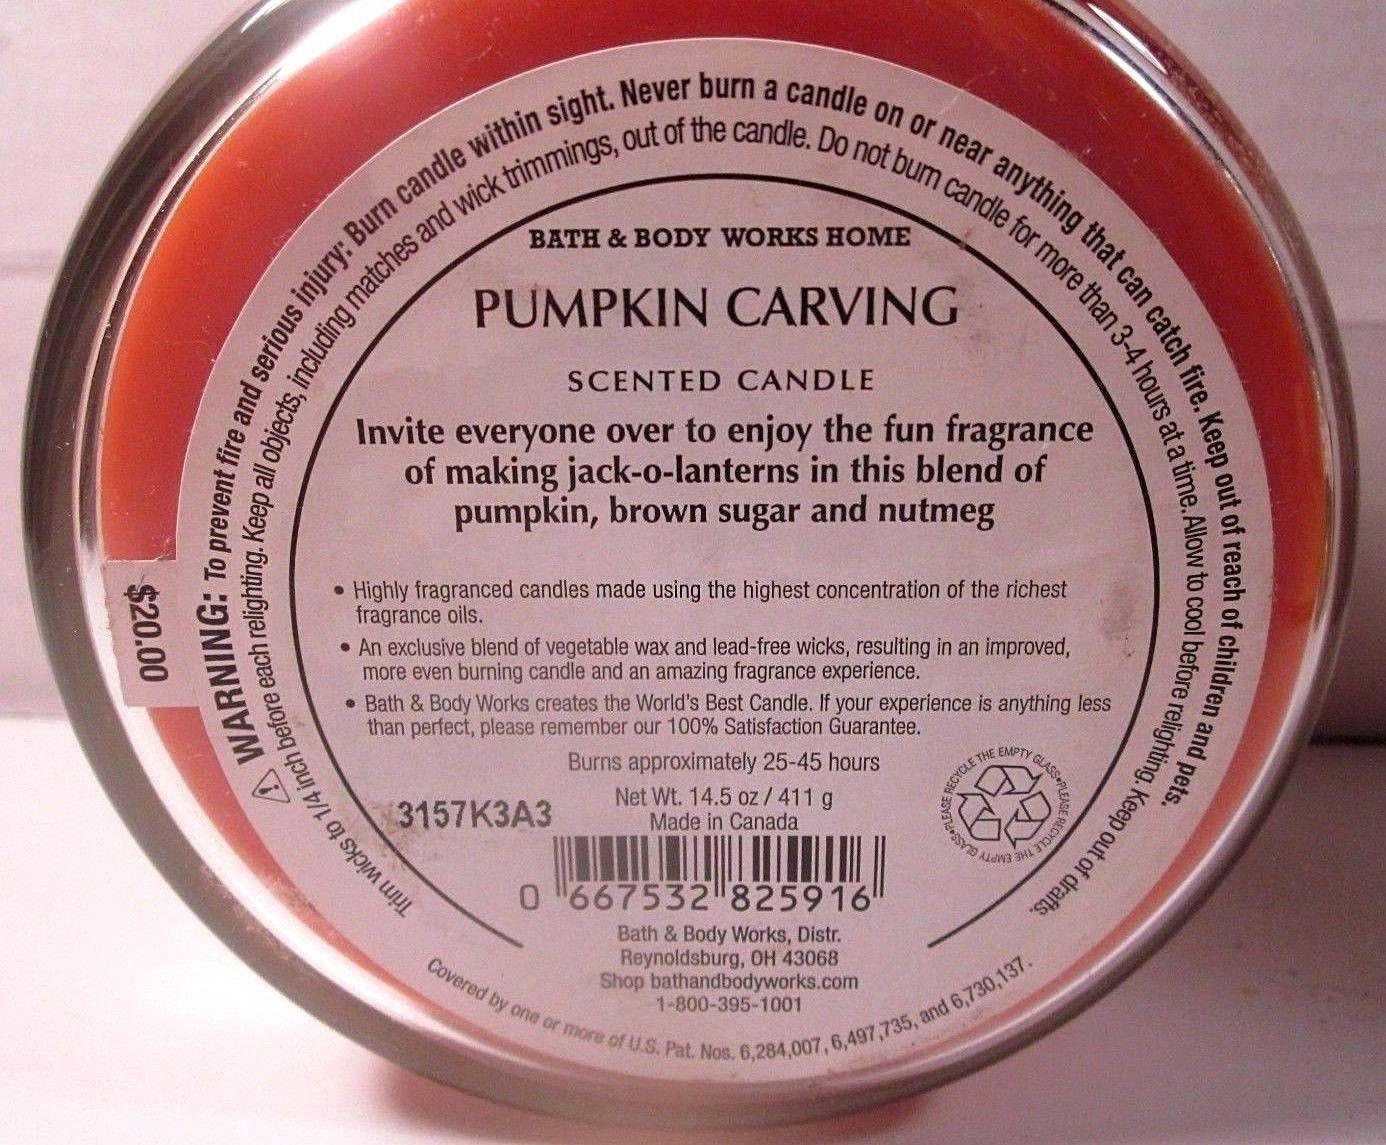 Bath & Body Works 3 wick 14.5 oz Candle jack-o-lanterns  Pumpkin Carving image 3